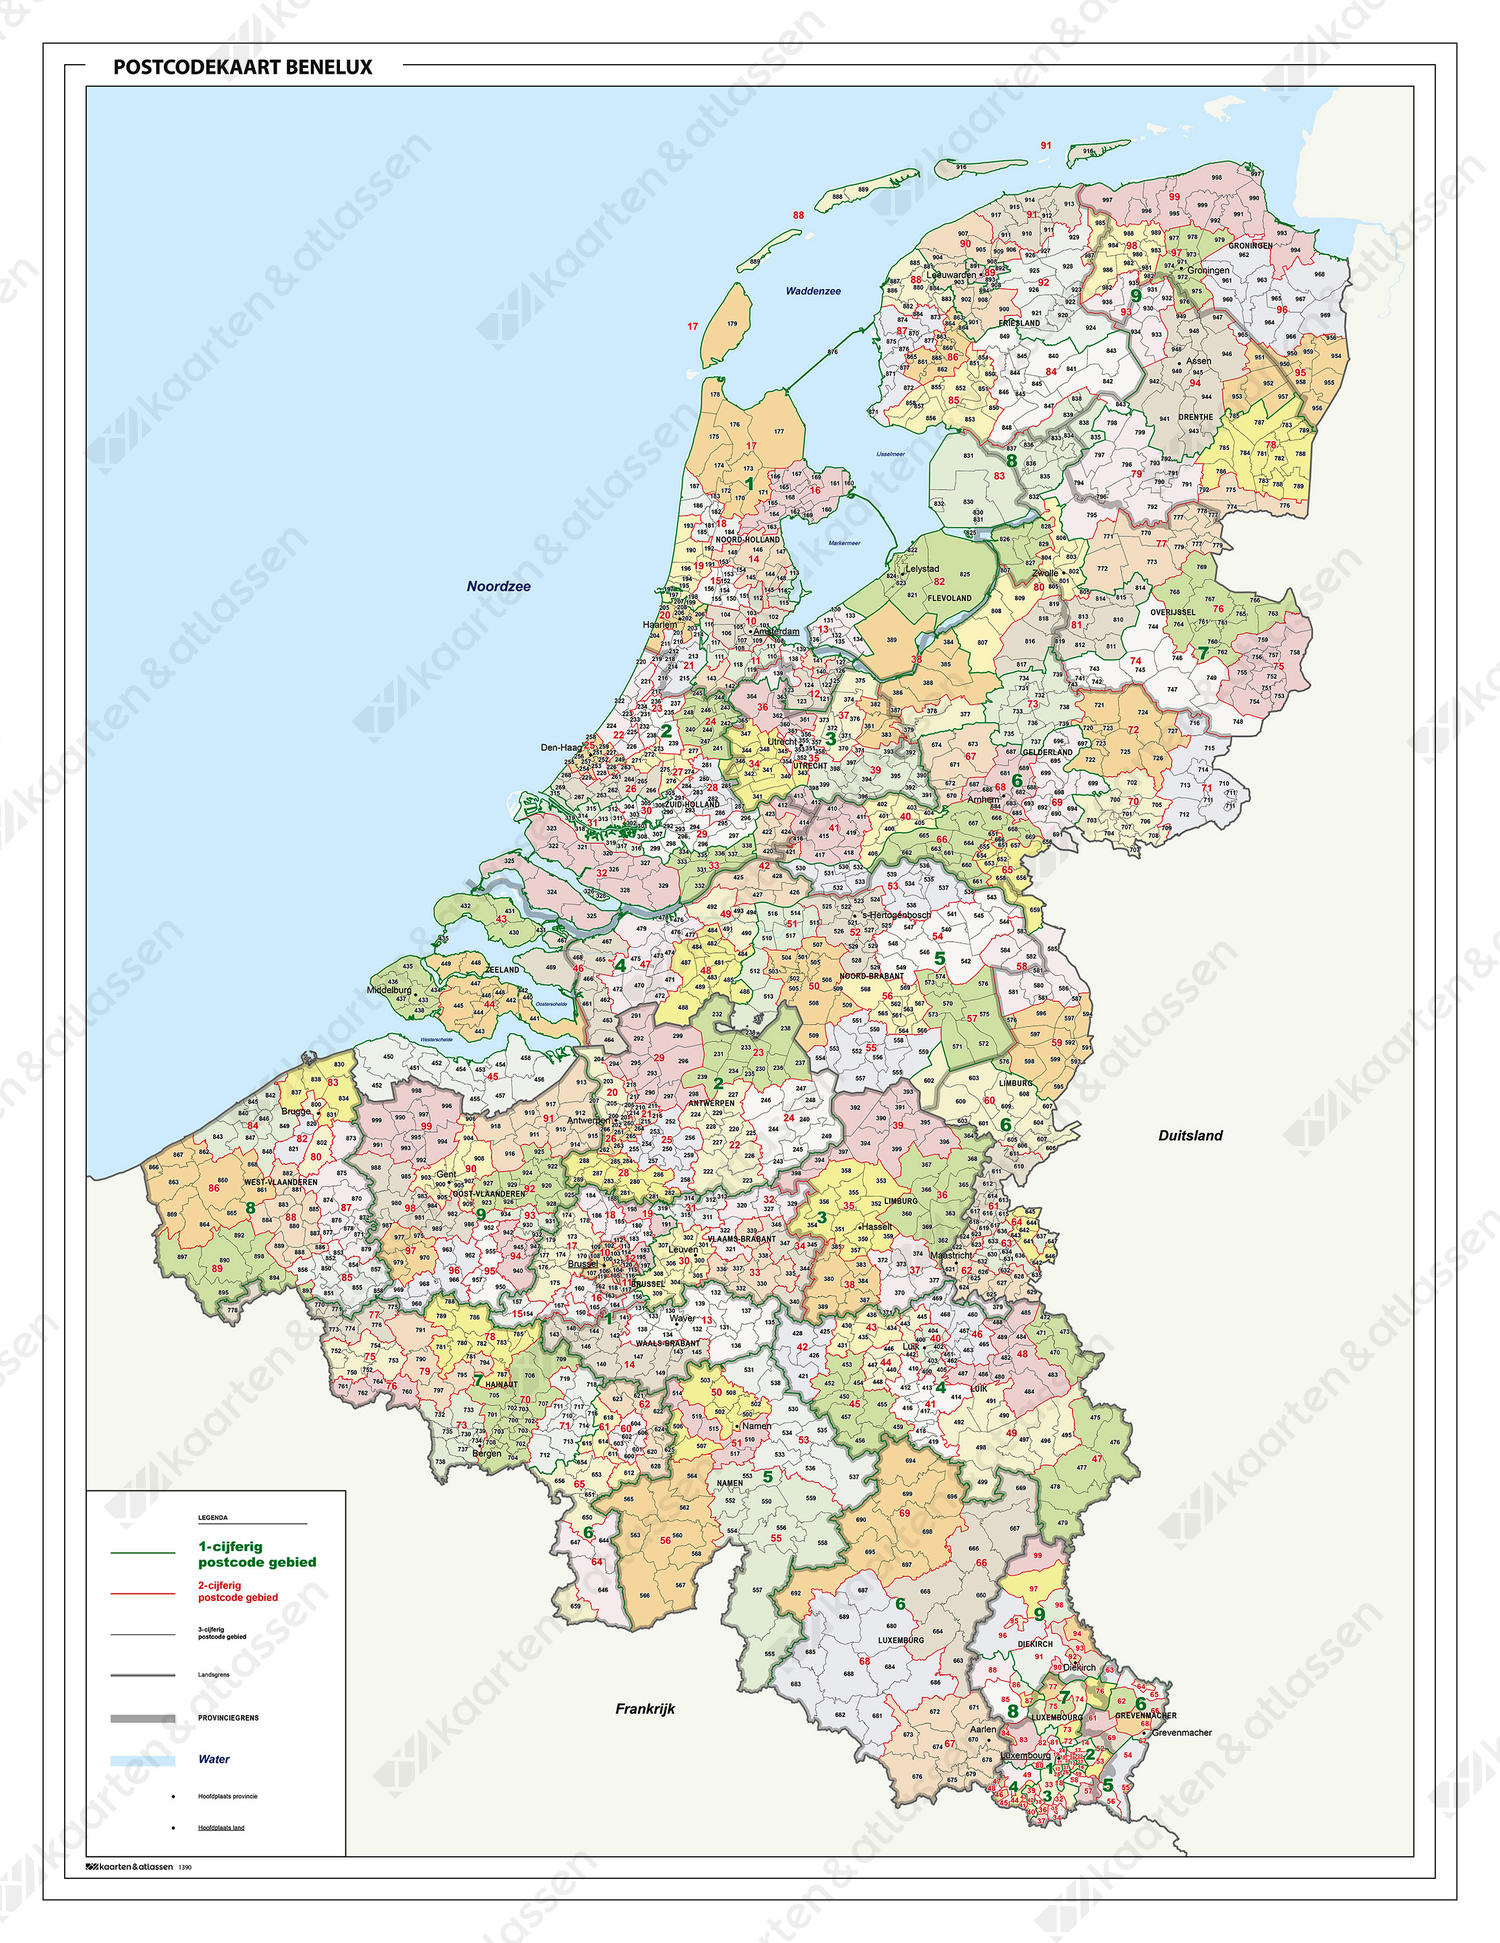 Digitale Postcodekaart Benelux 1-2-3 cijferig 1390